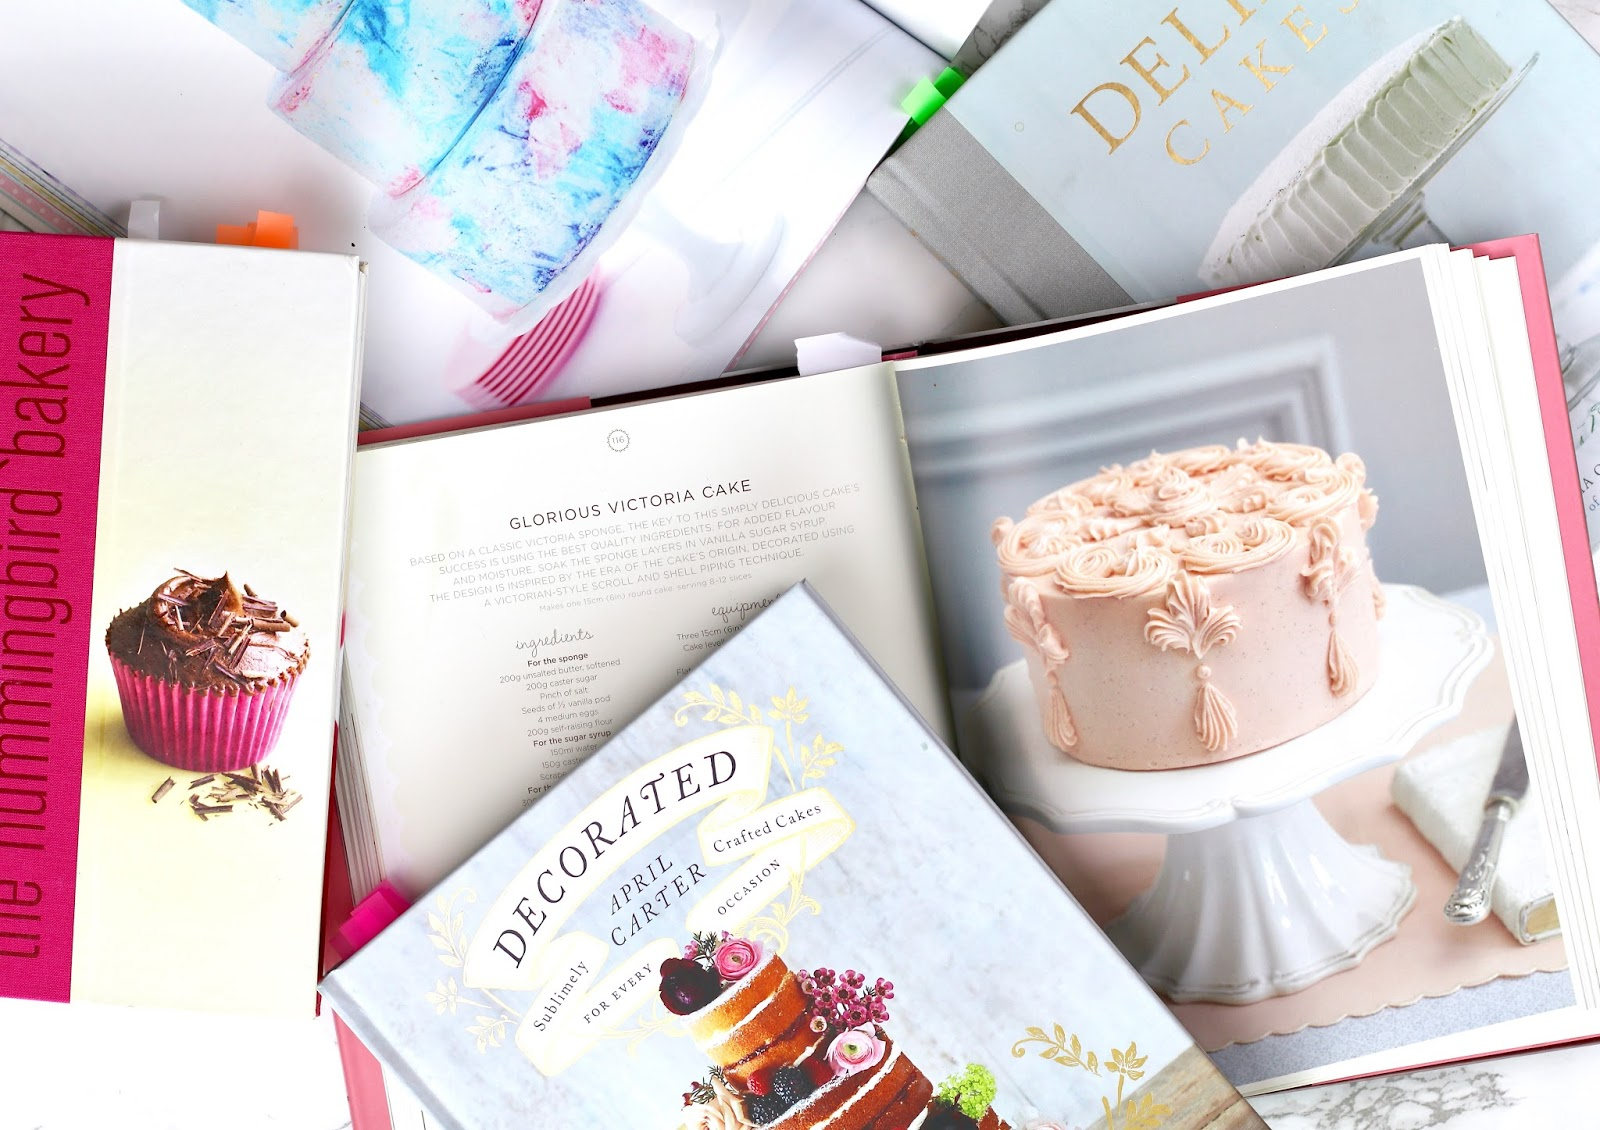 Favourite-baking-books-hummingbird-bakery-april-carter-decorated-delia-smith-peggy-porschen-sweetpolita